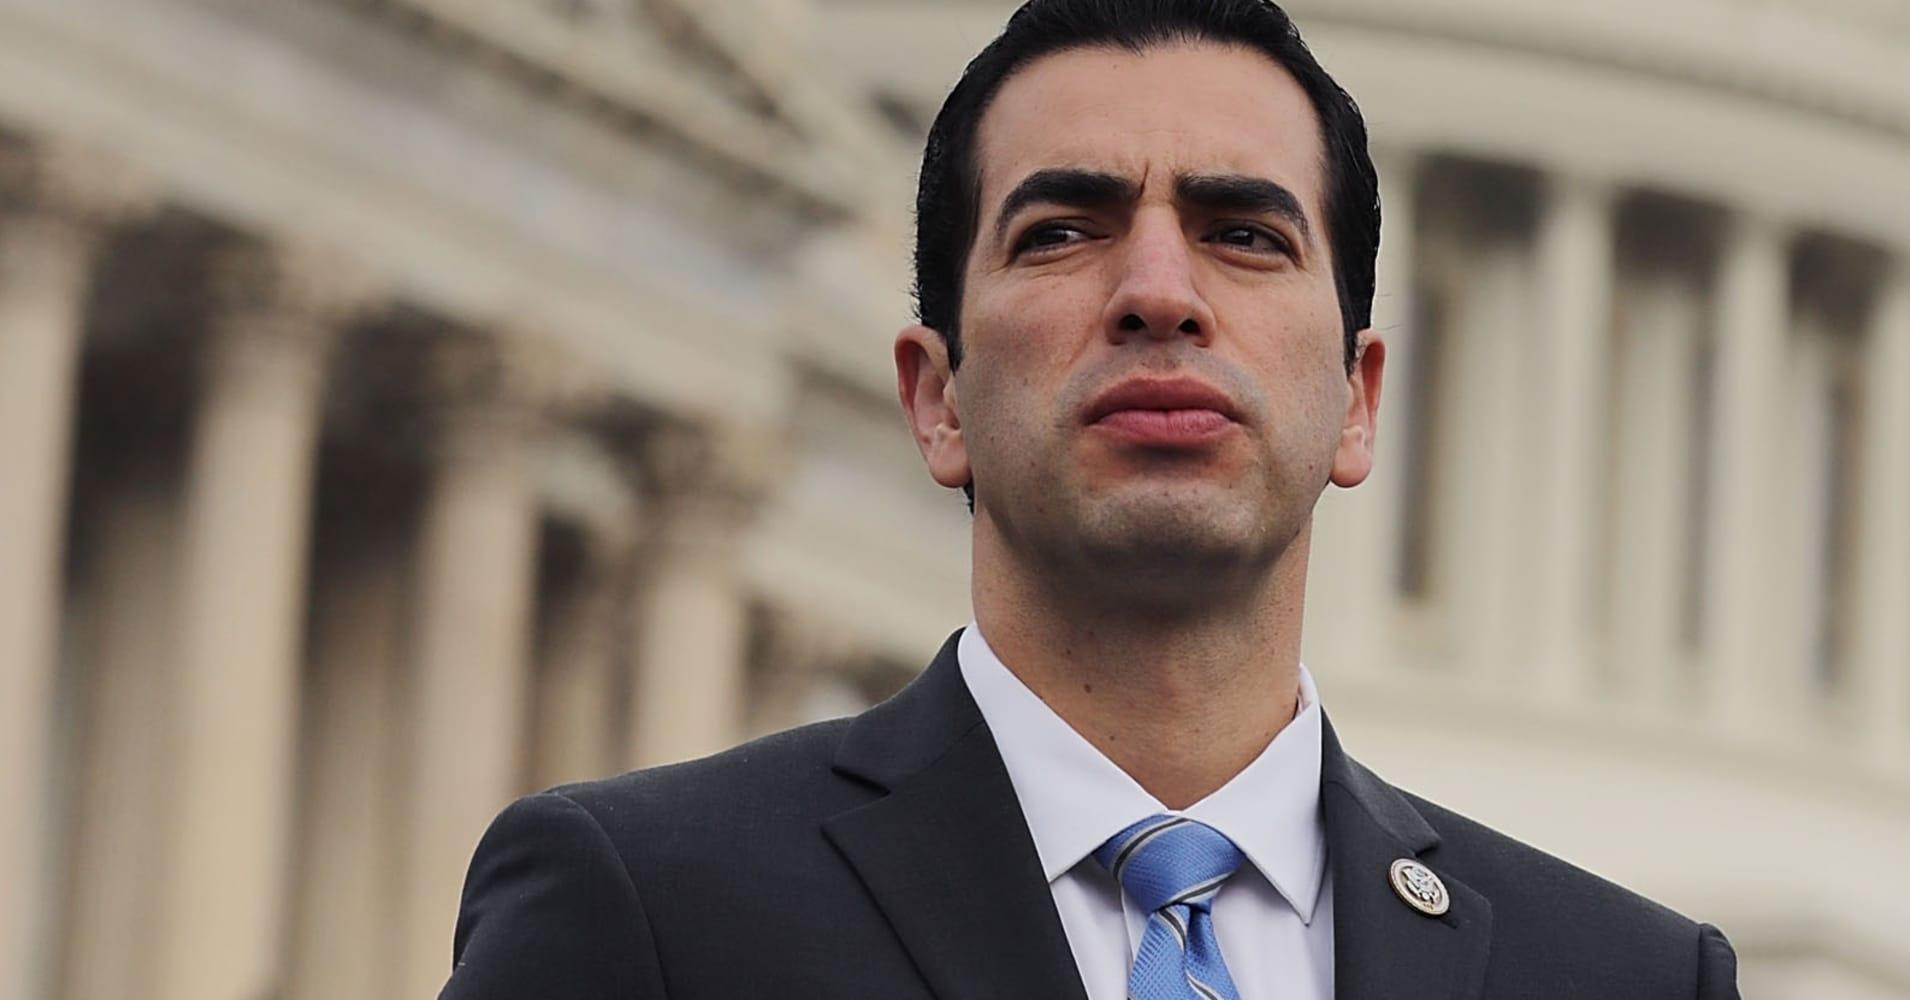 Nevada Democrat, facing ethics probe, won't seek re-election